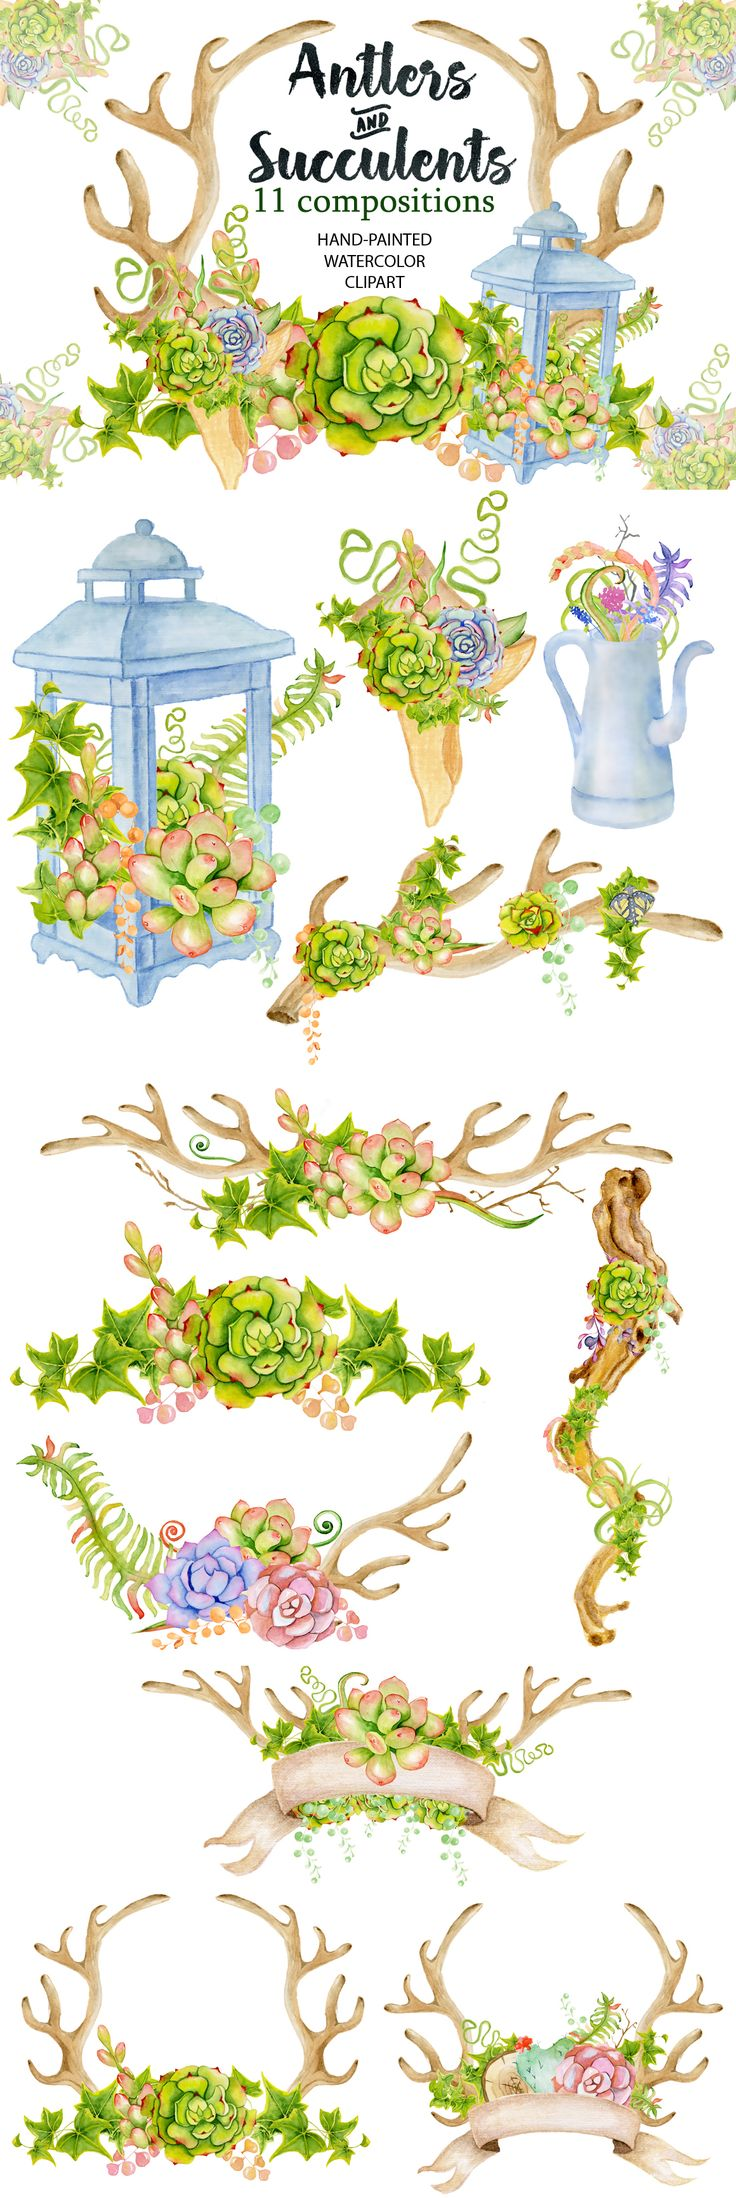 Antlers clip art, succulents clip art, watercolor clip art, watercolor antlers, floral antlers, floral clip art, digital, wedding bouquet